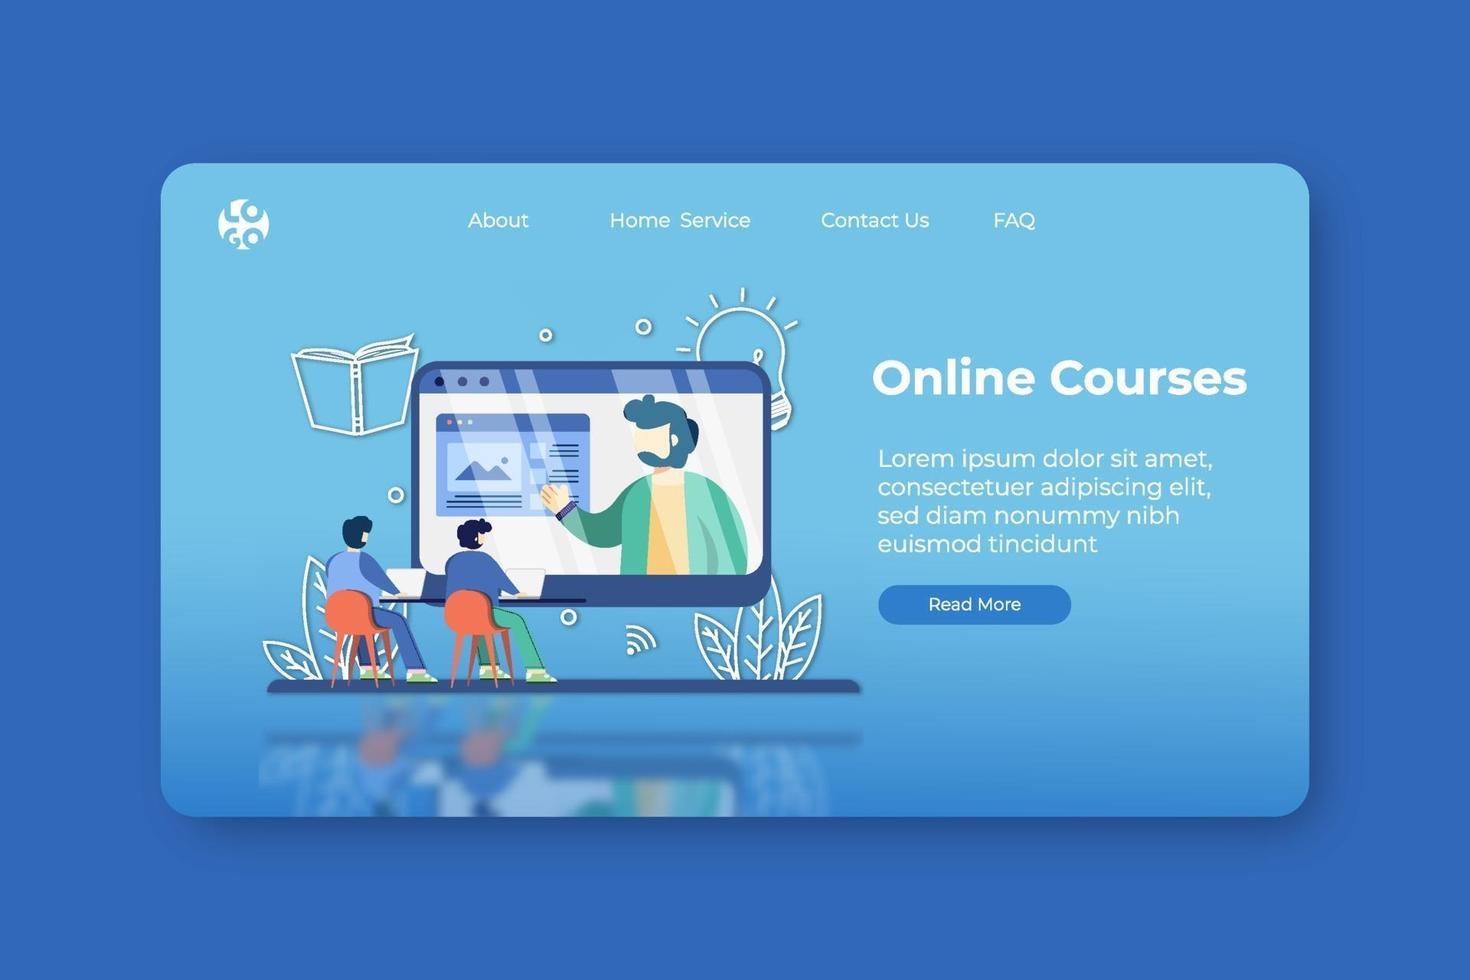 Modern Flat Design Vector Illustration. Online Courses Landing Page and Web Banner Design Template. Training Online, Webinar, Online Teaching, Online Education, Learn Anywhere, Digital Education